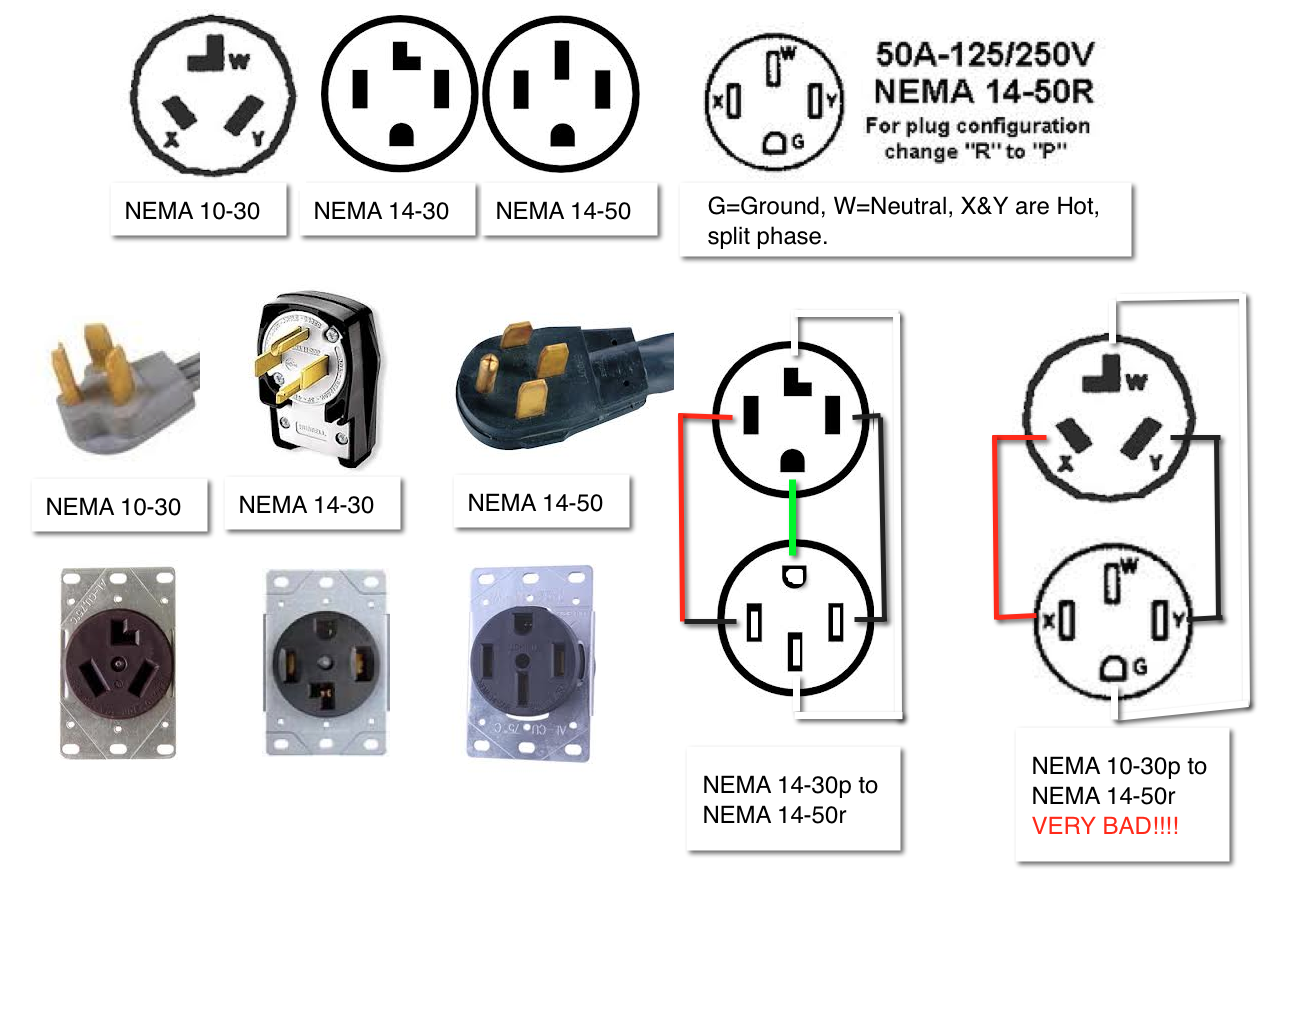 nema-6-50-to-10-30-plug-wiring-diagram-8 Nema Receptacle Wiring Diagram on l14-20, 17 stepper motor l289n driver, l14-30r, l6-30r, 6-20r receptacle,